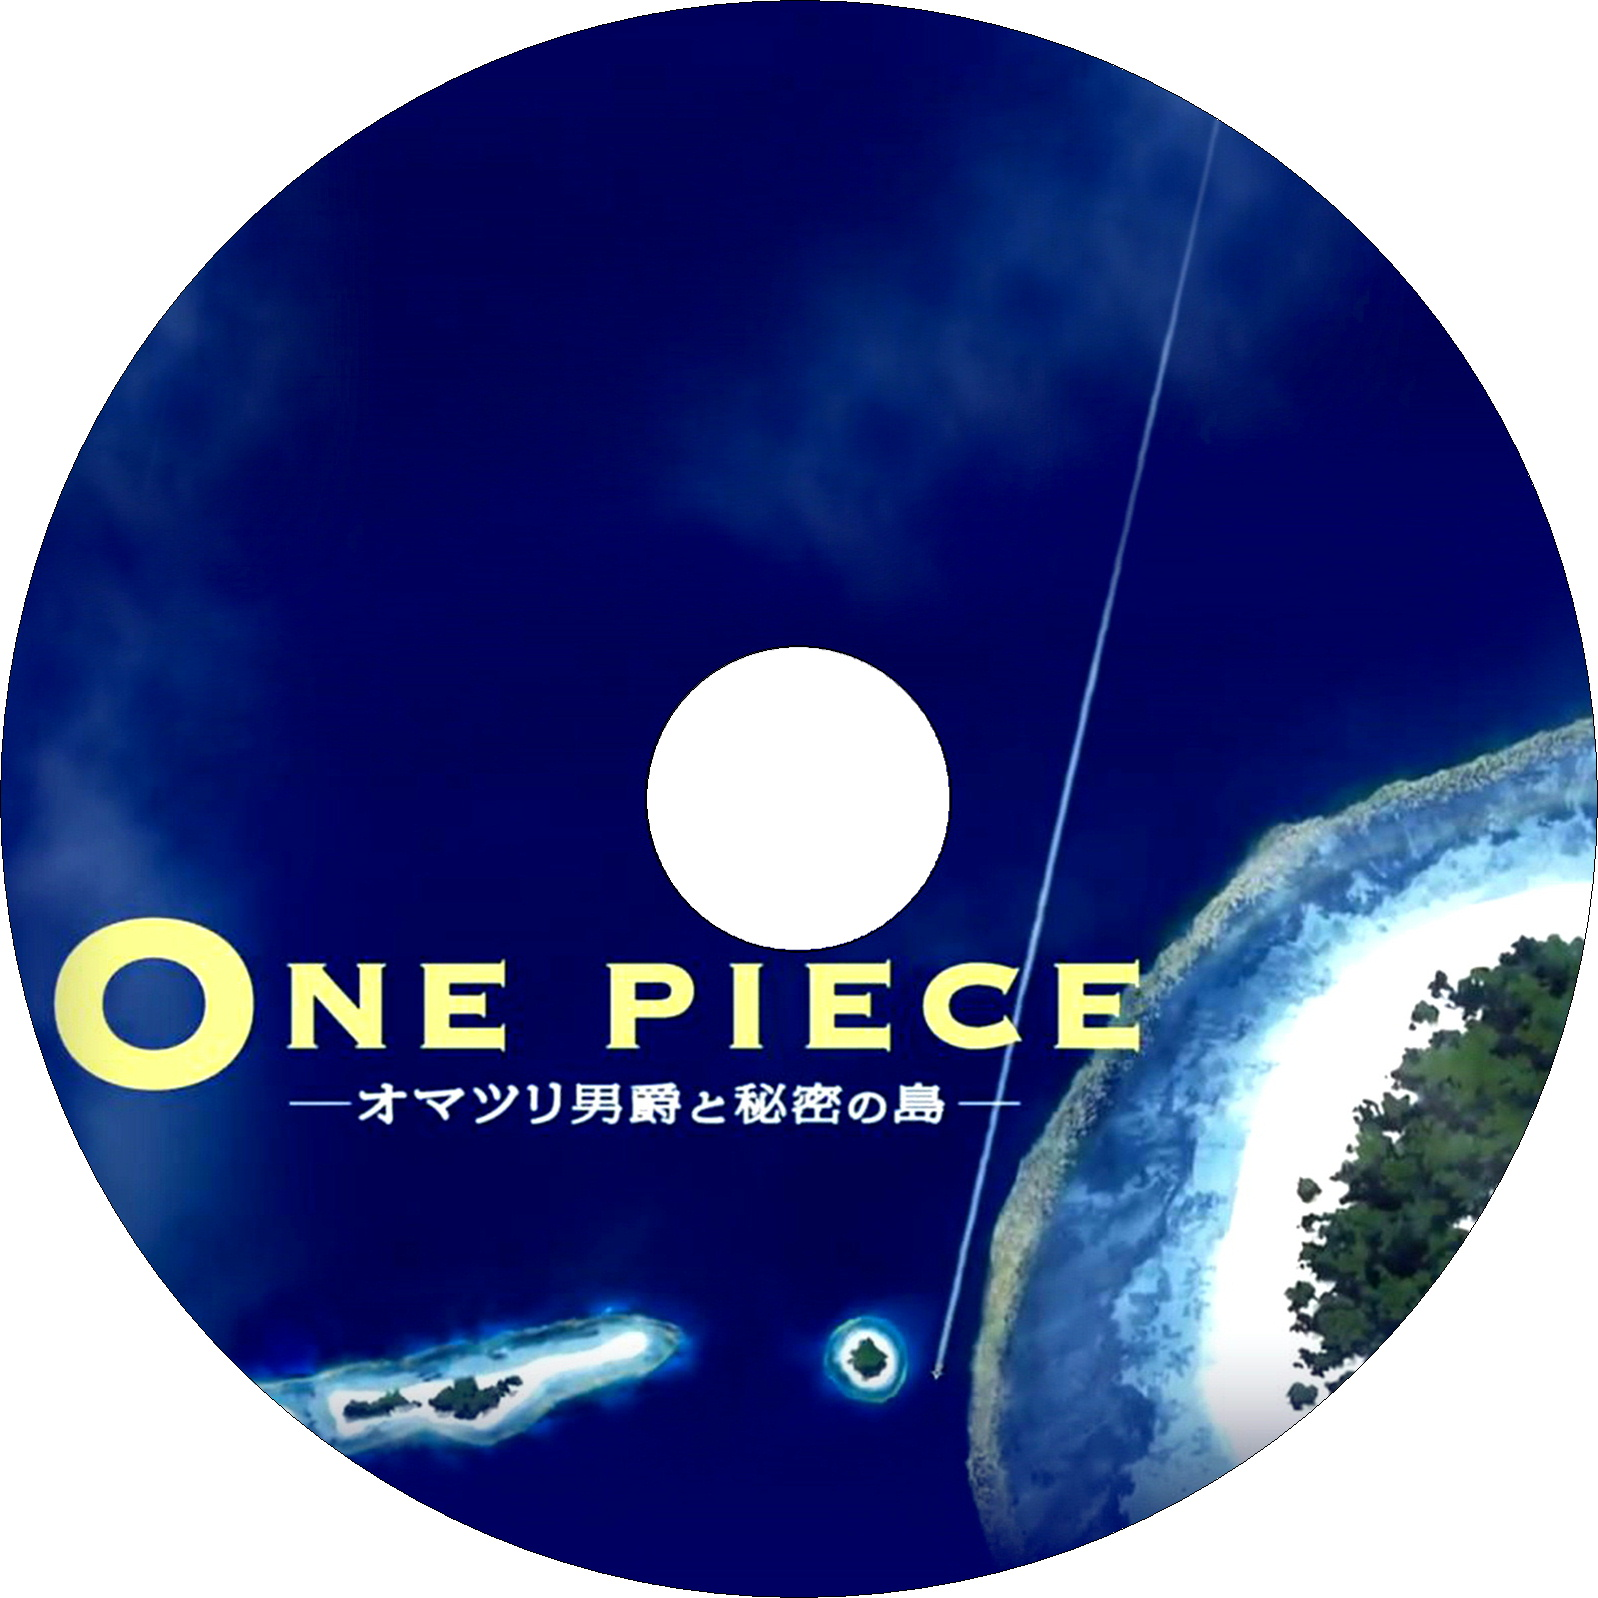 ONE PIECE THE MOVIE オマツリ男爵と秘密の島 ラベル